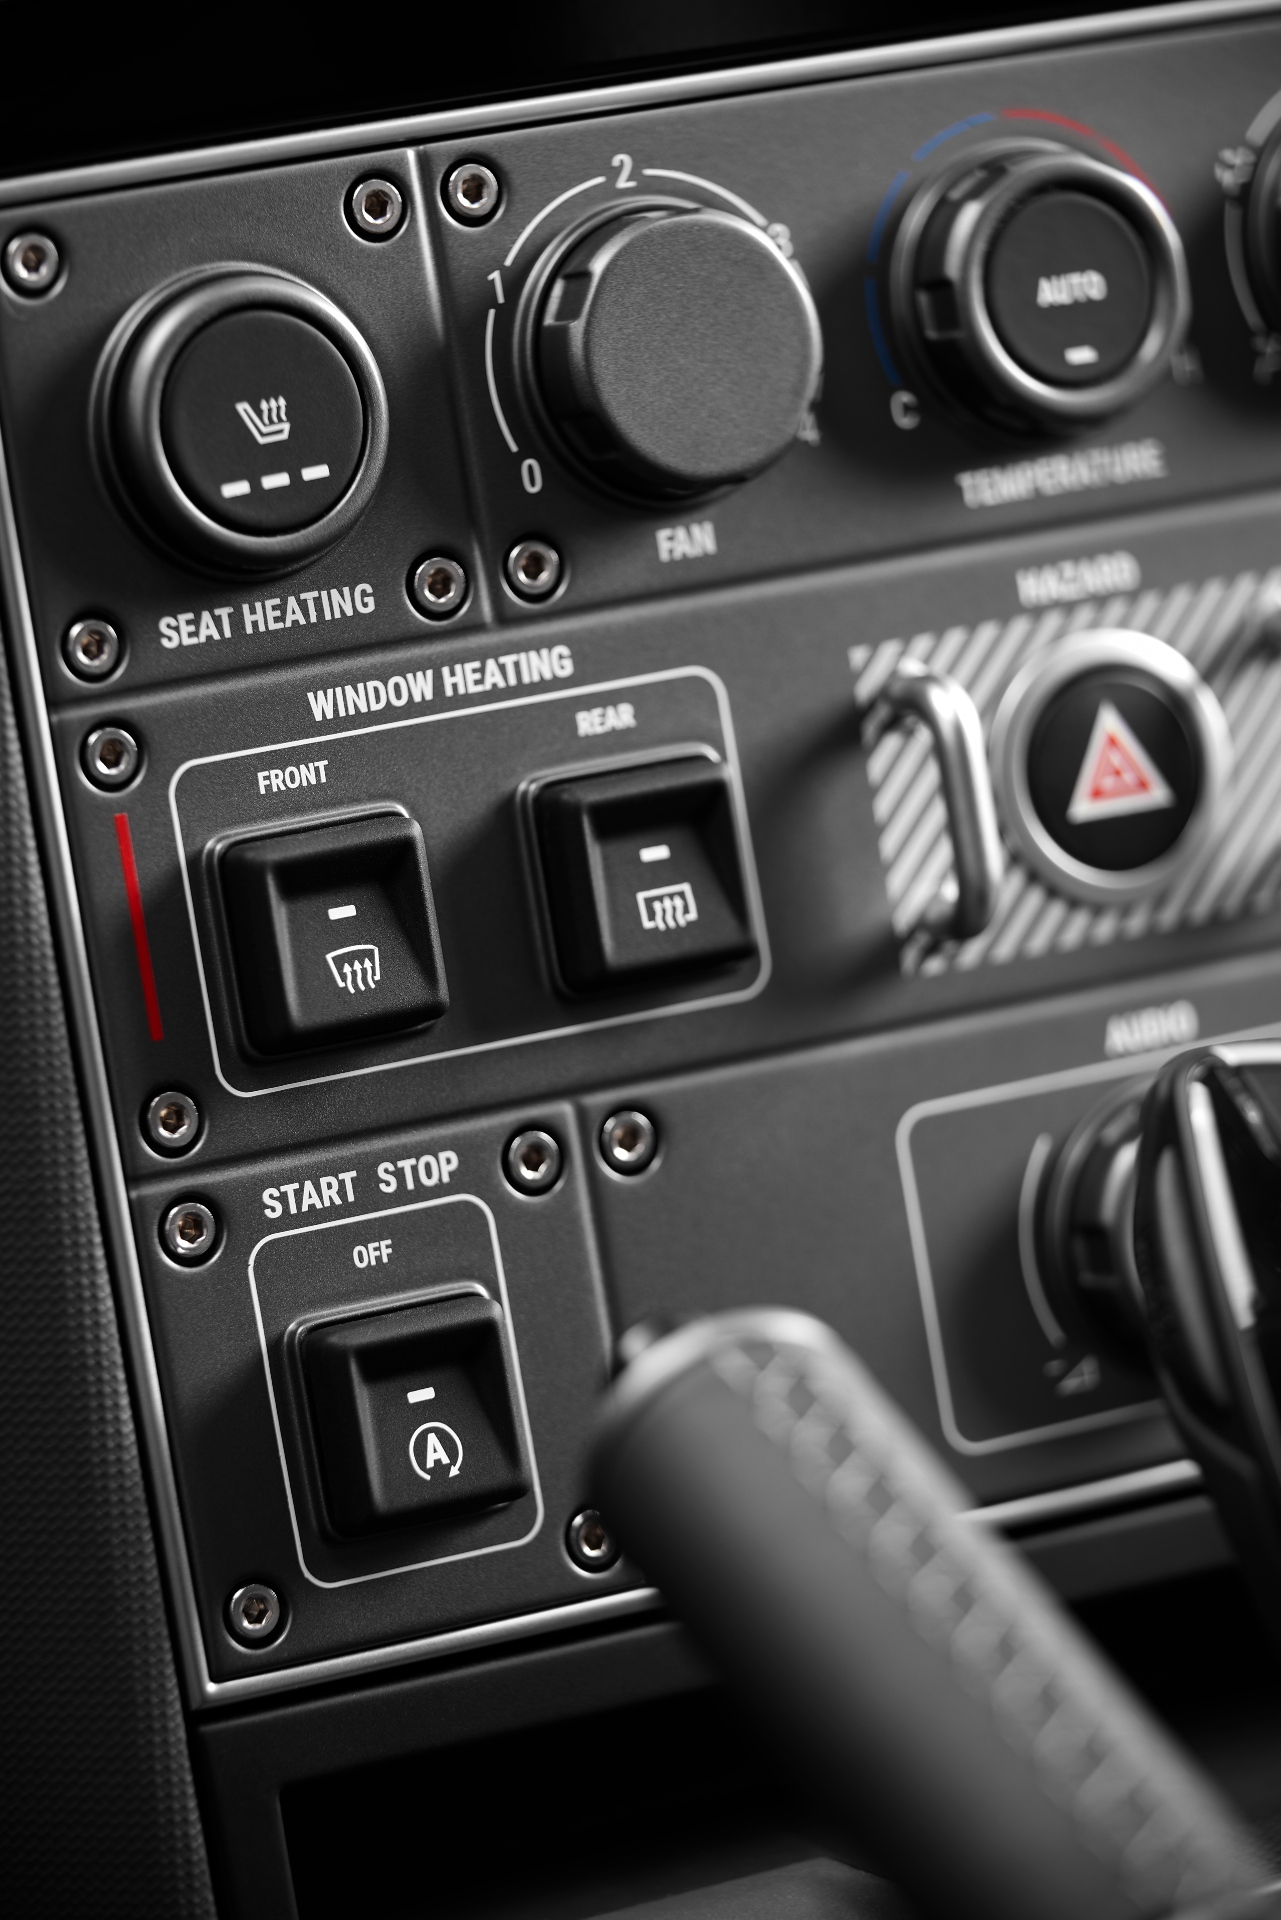 Ineos Grenadier interior gauges switches detail